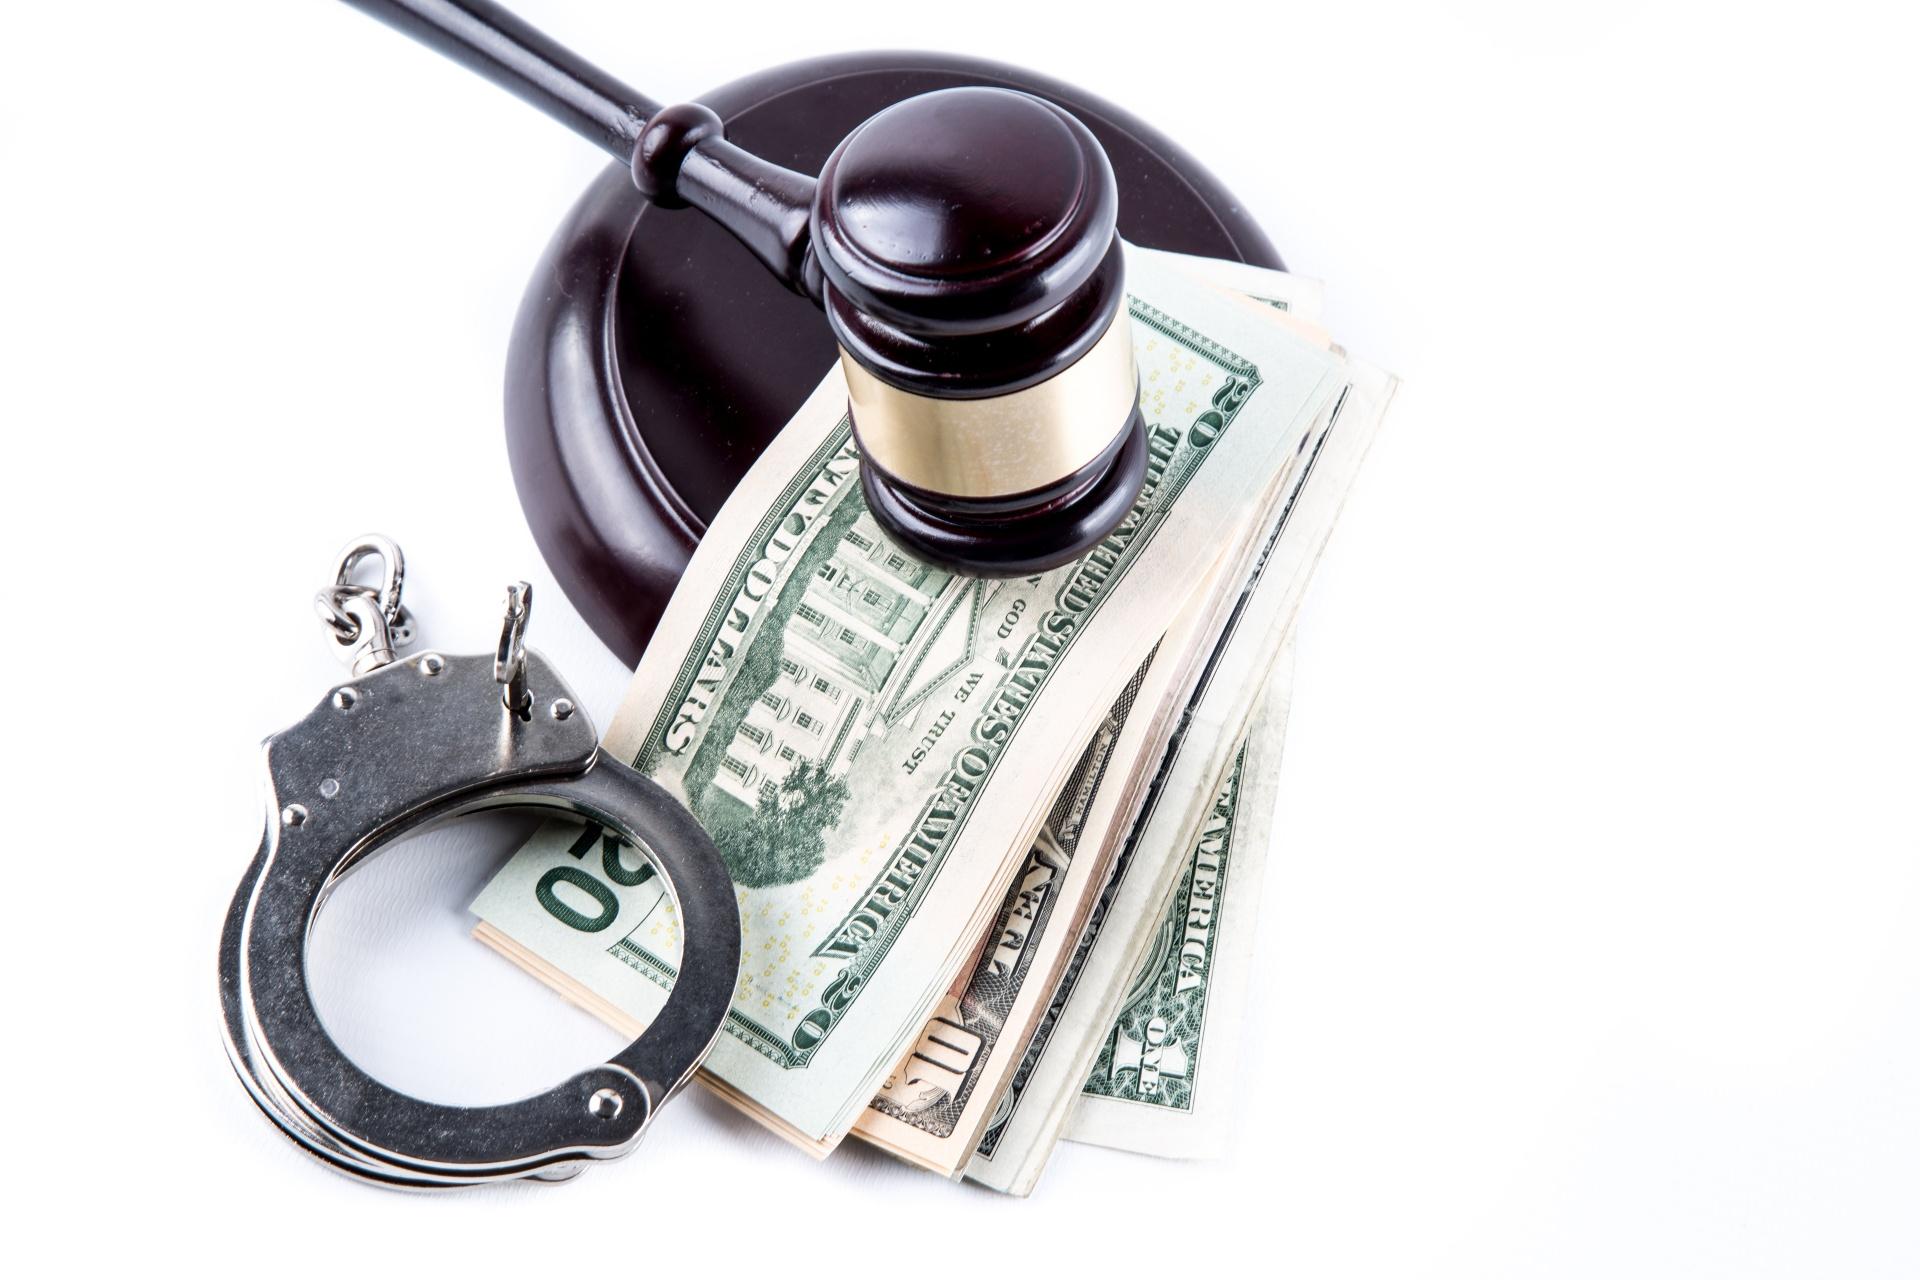 judge-gavel-handcuffs-and-money-1461289438fb3